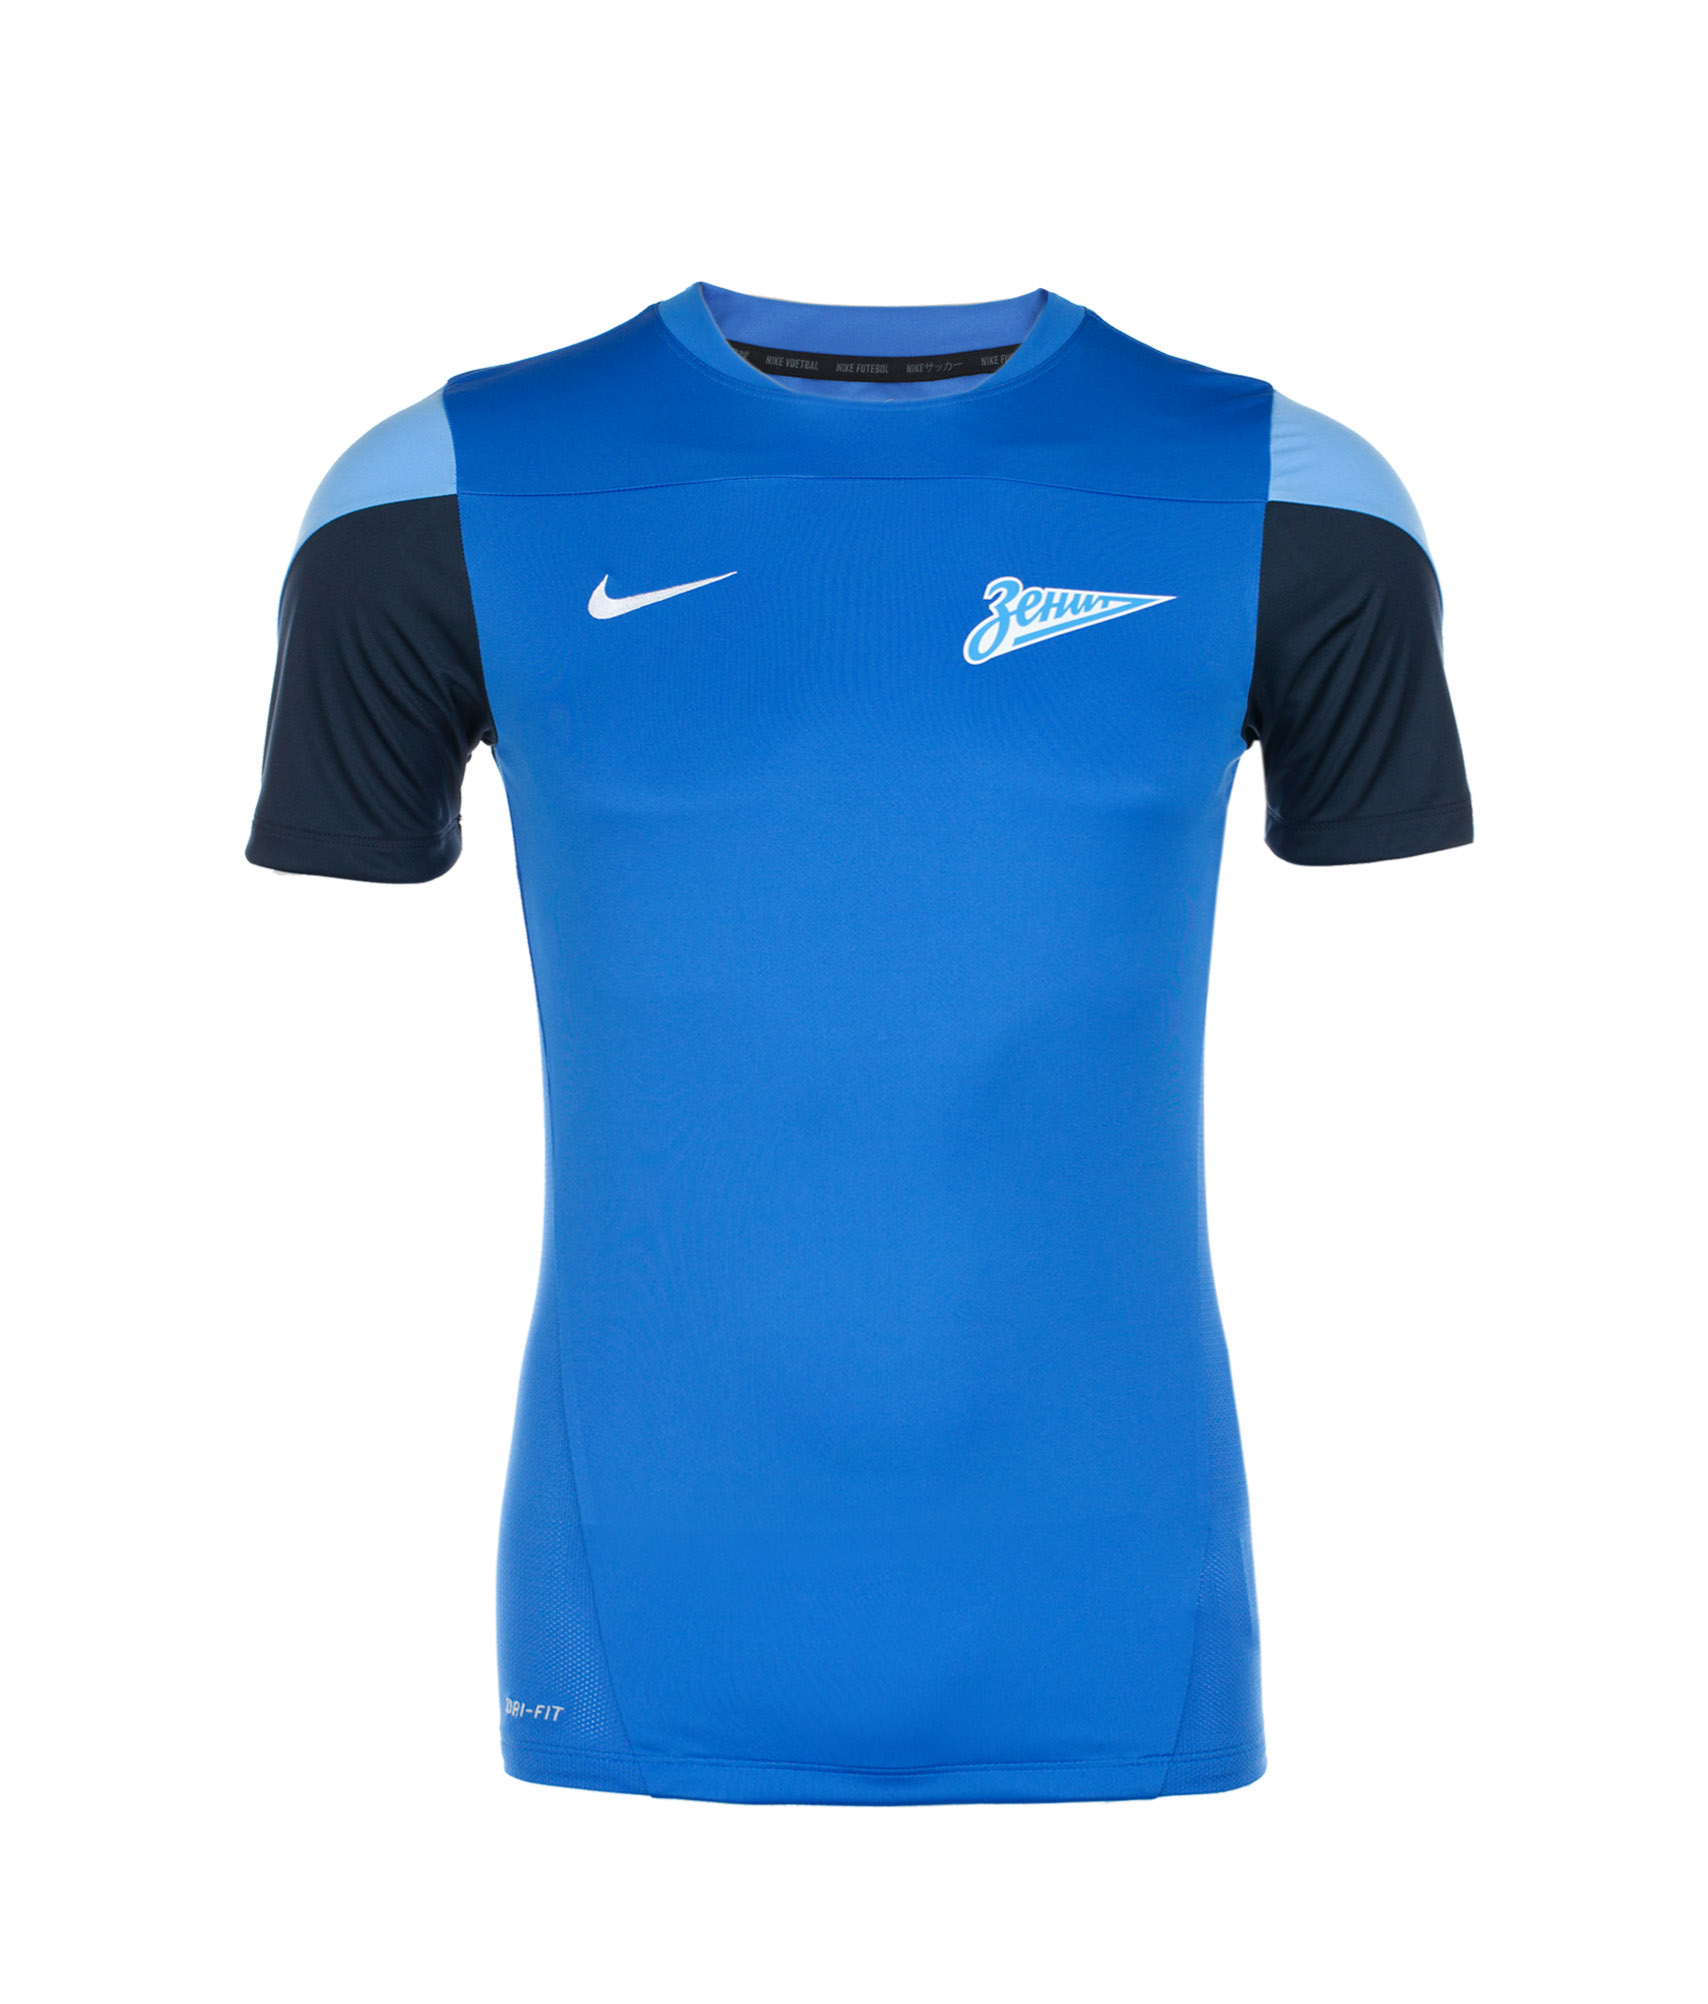 Футболка тренировочная Nike SQUAD SS TRNG TOP, Цвет-Синий, Размер-S